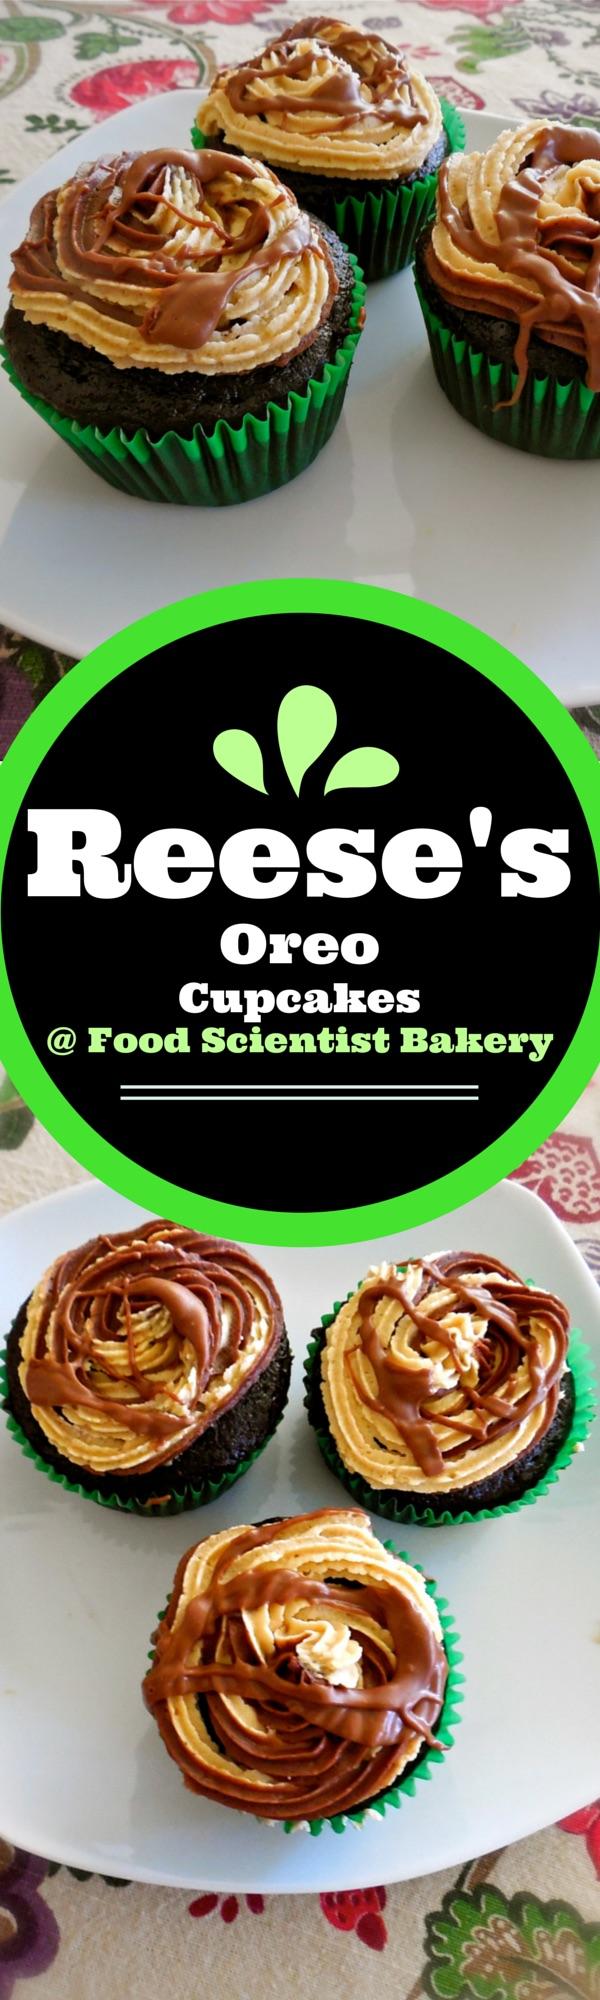 Reese's Oreo Cupcakes